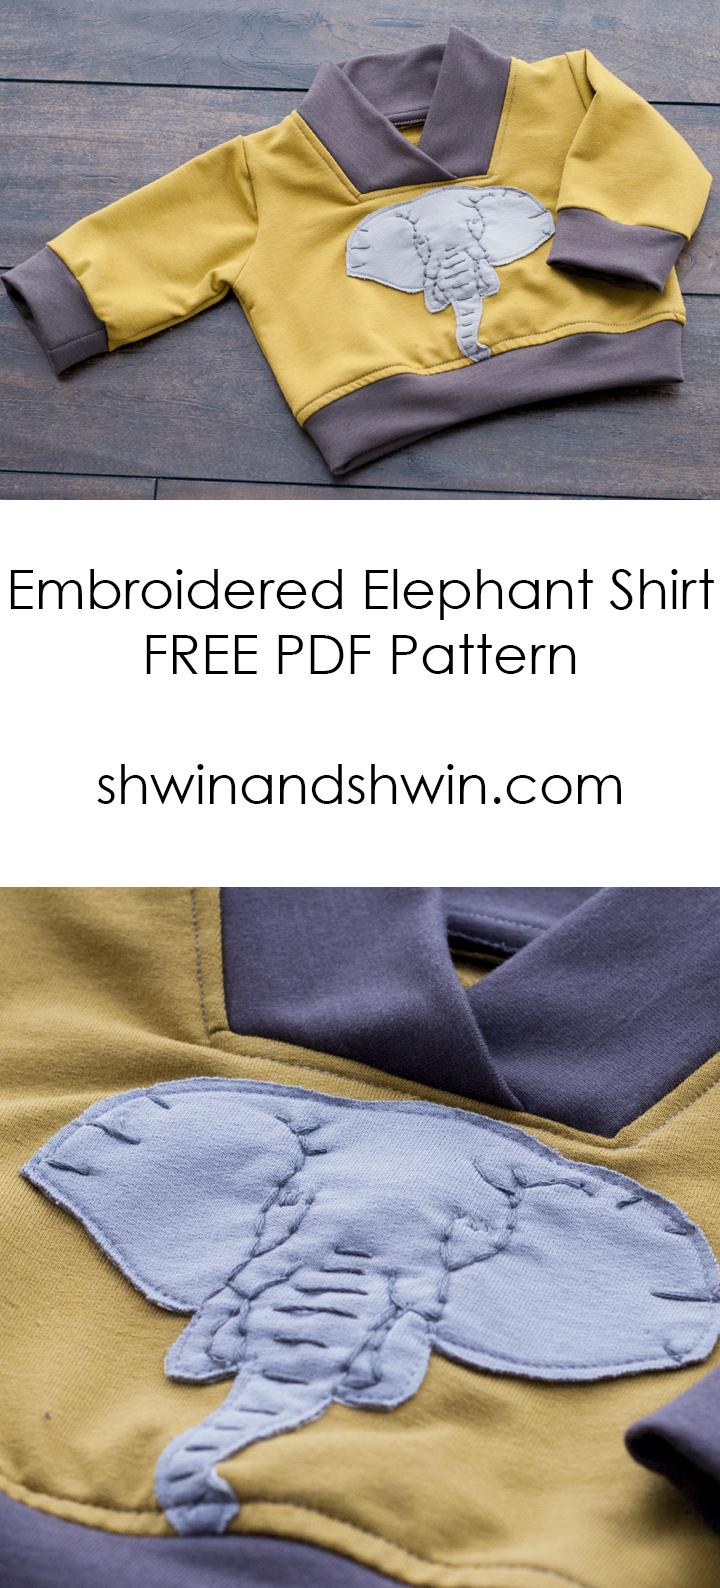 Embroidered Elephant Sweatshirt || Free PDF Pattern&Template || Shwin&Shwin